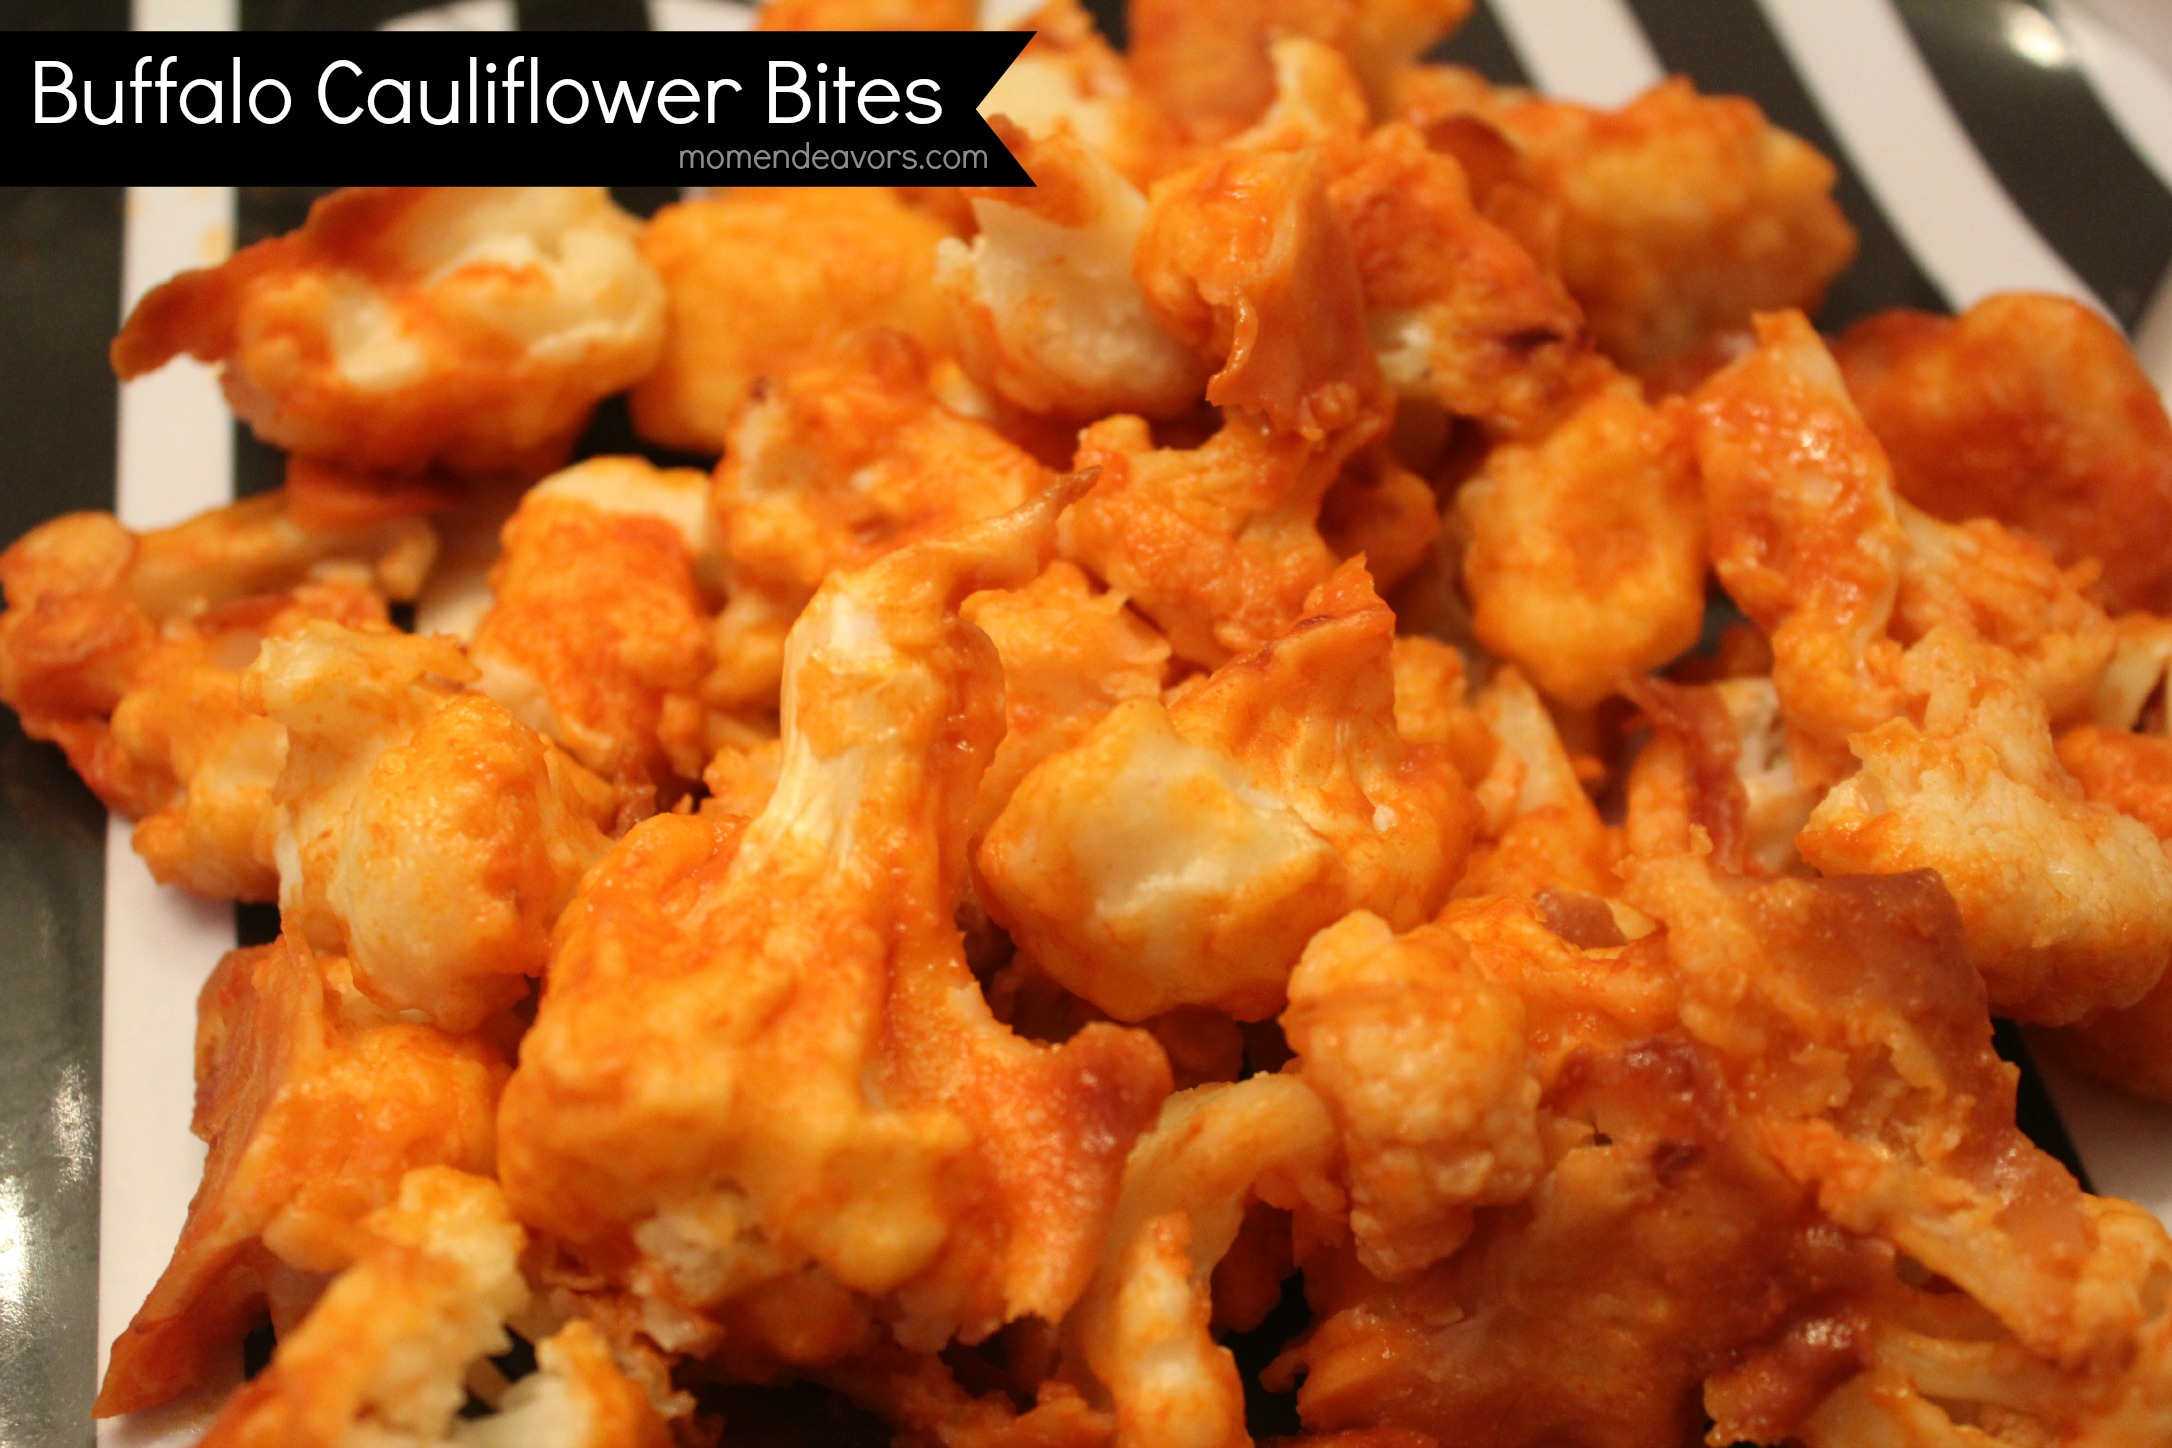 Baked Gluten Free Buffalo Cauliflower Bites